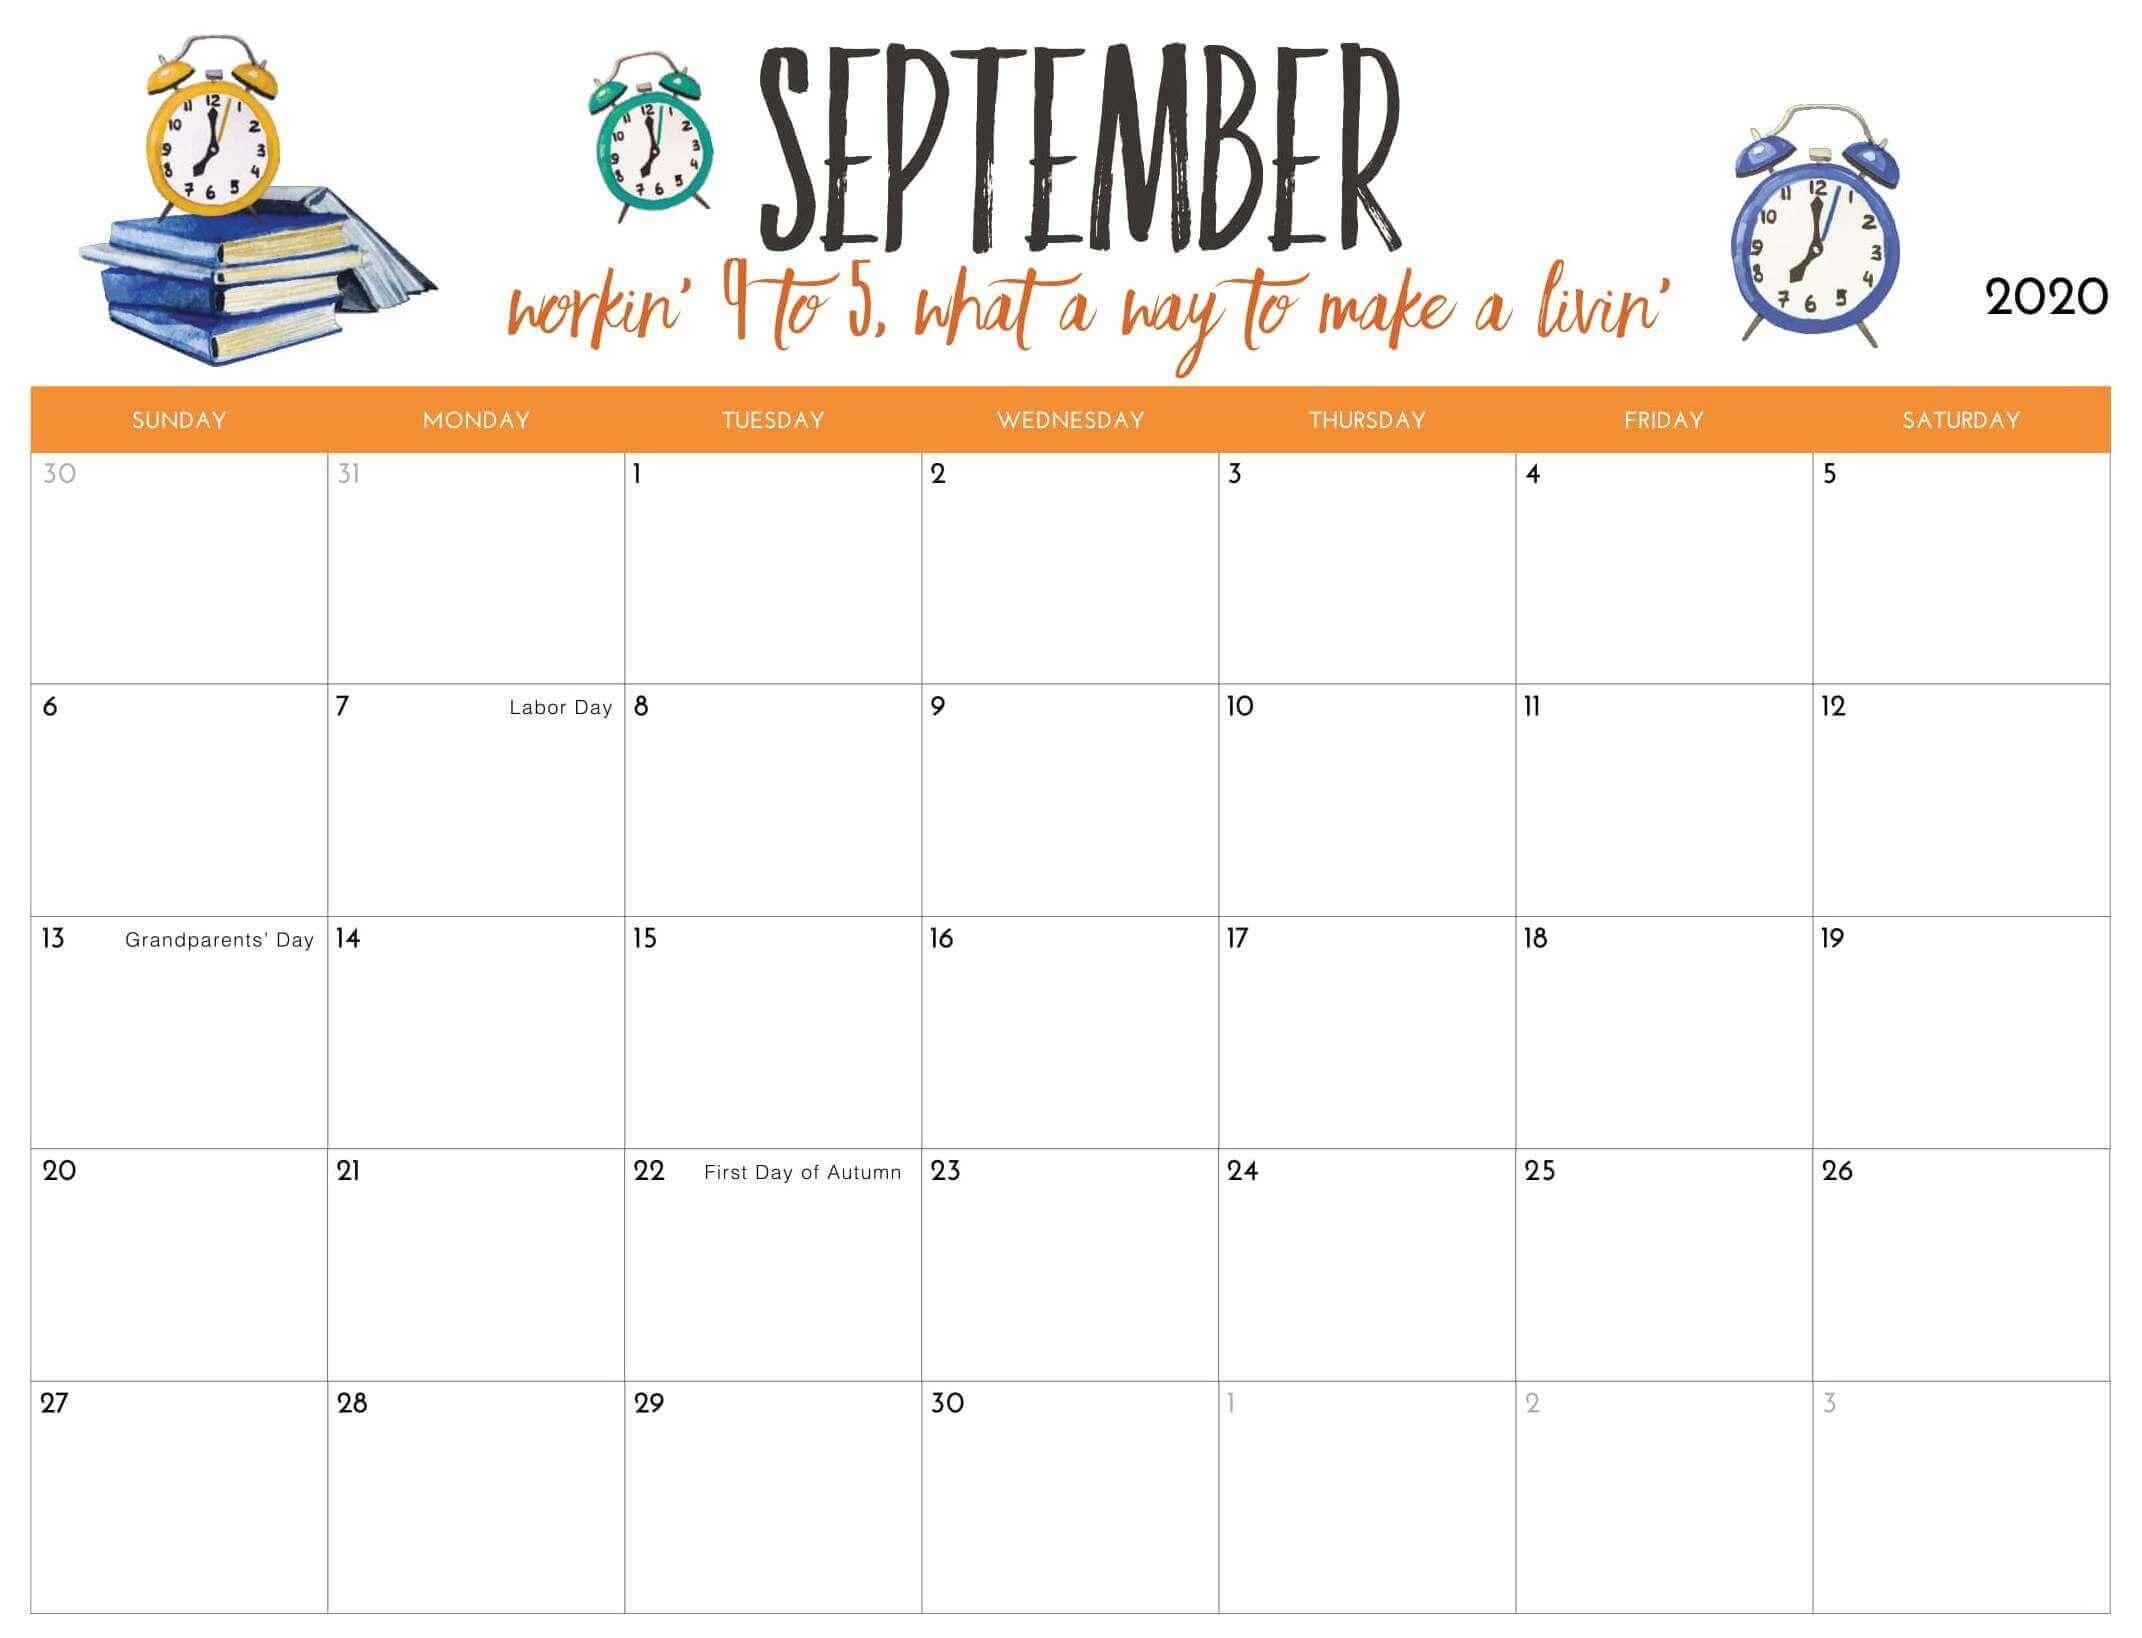 2020 September Calendar With Holidays